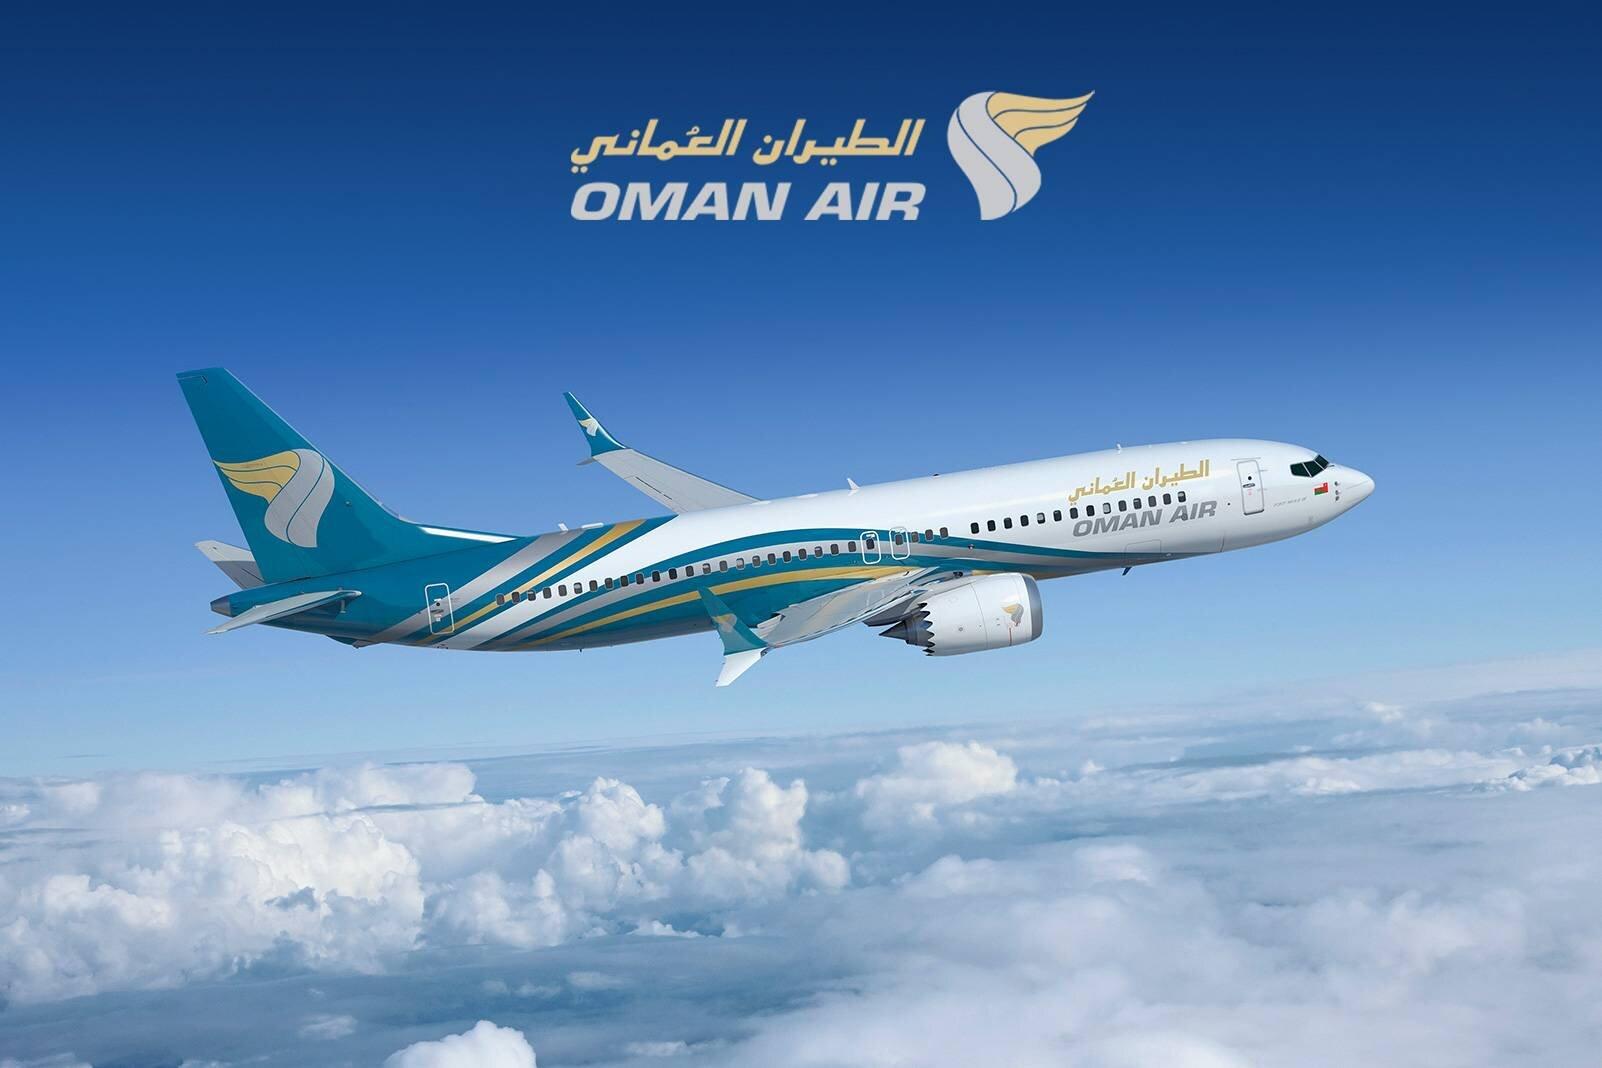 Oman Air İndirim Fırsatı